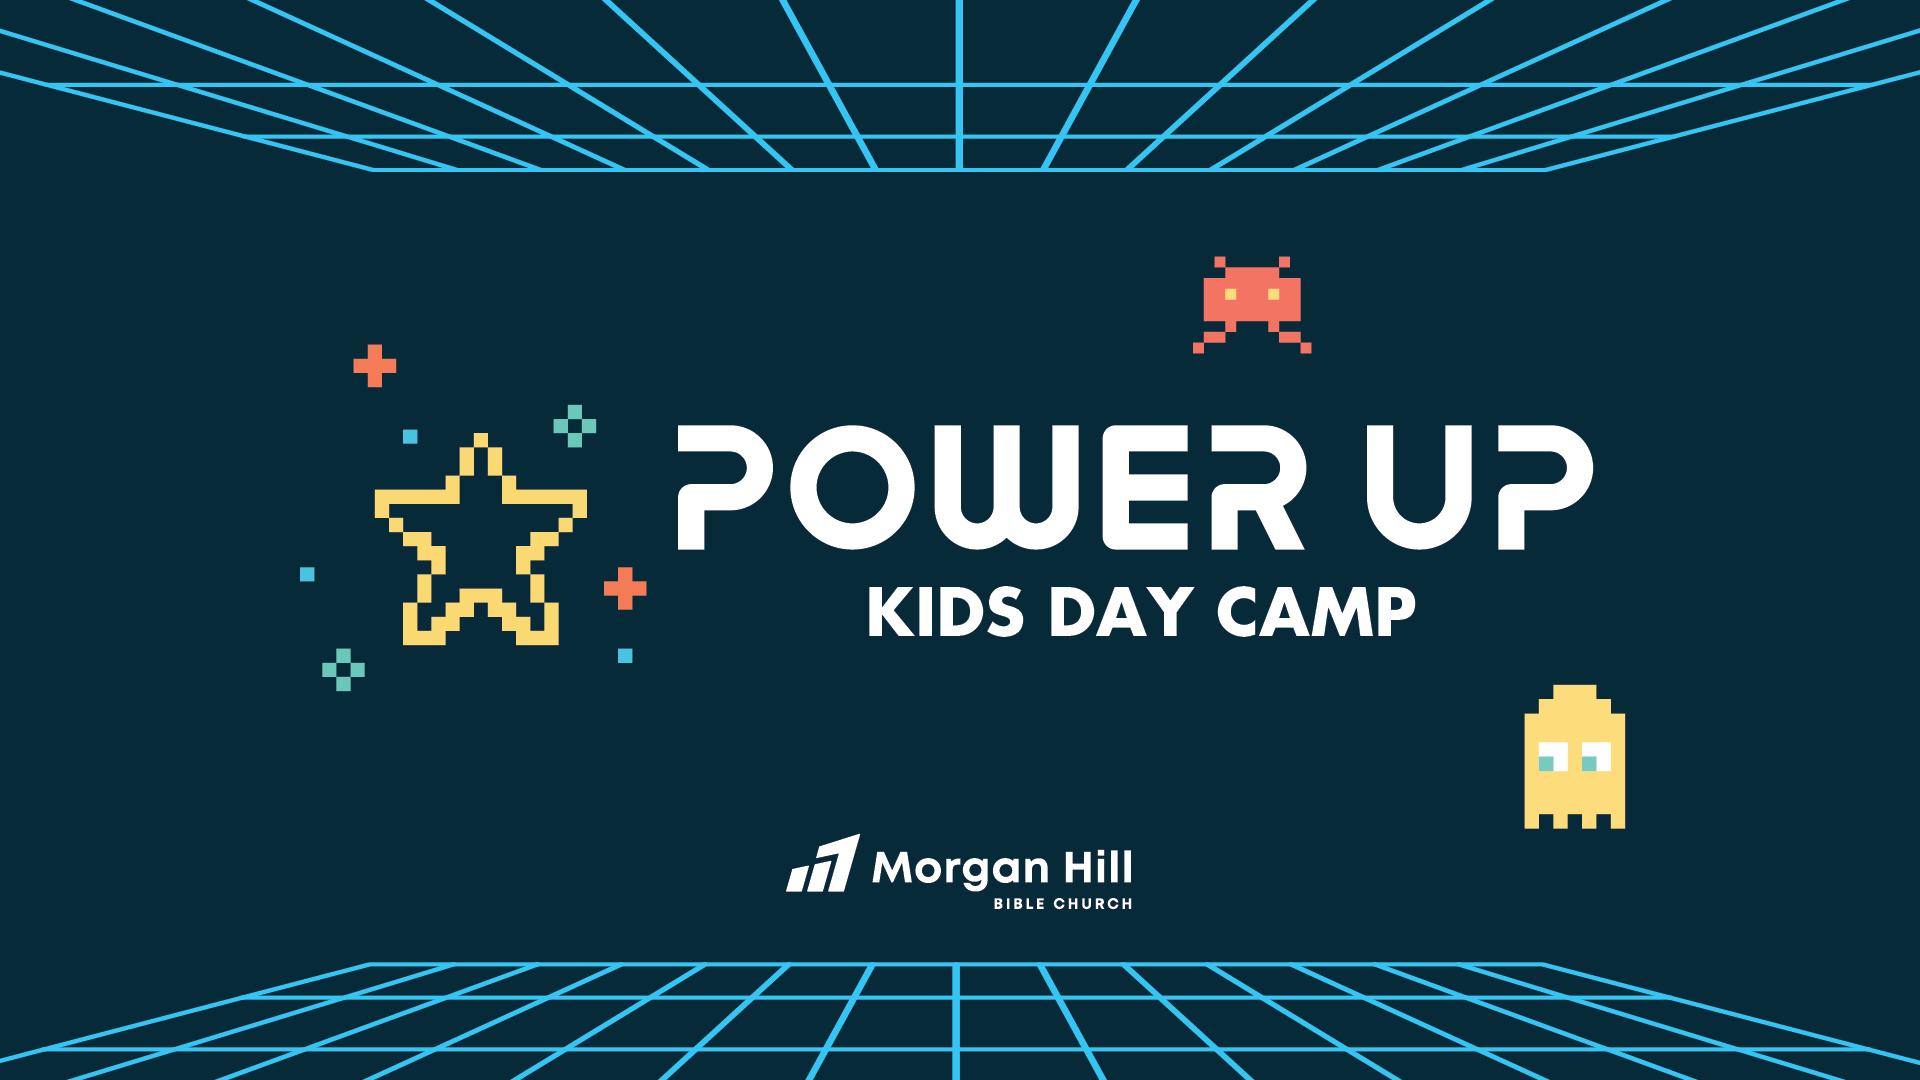 kids_daycamp2019_1920x1080-01.jpg